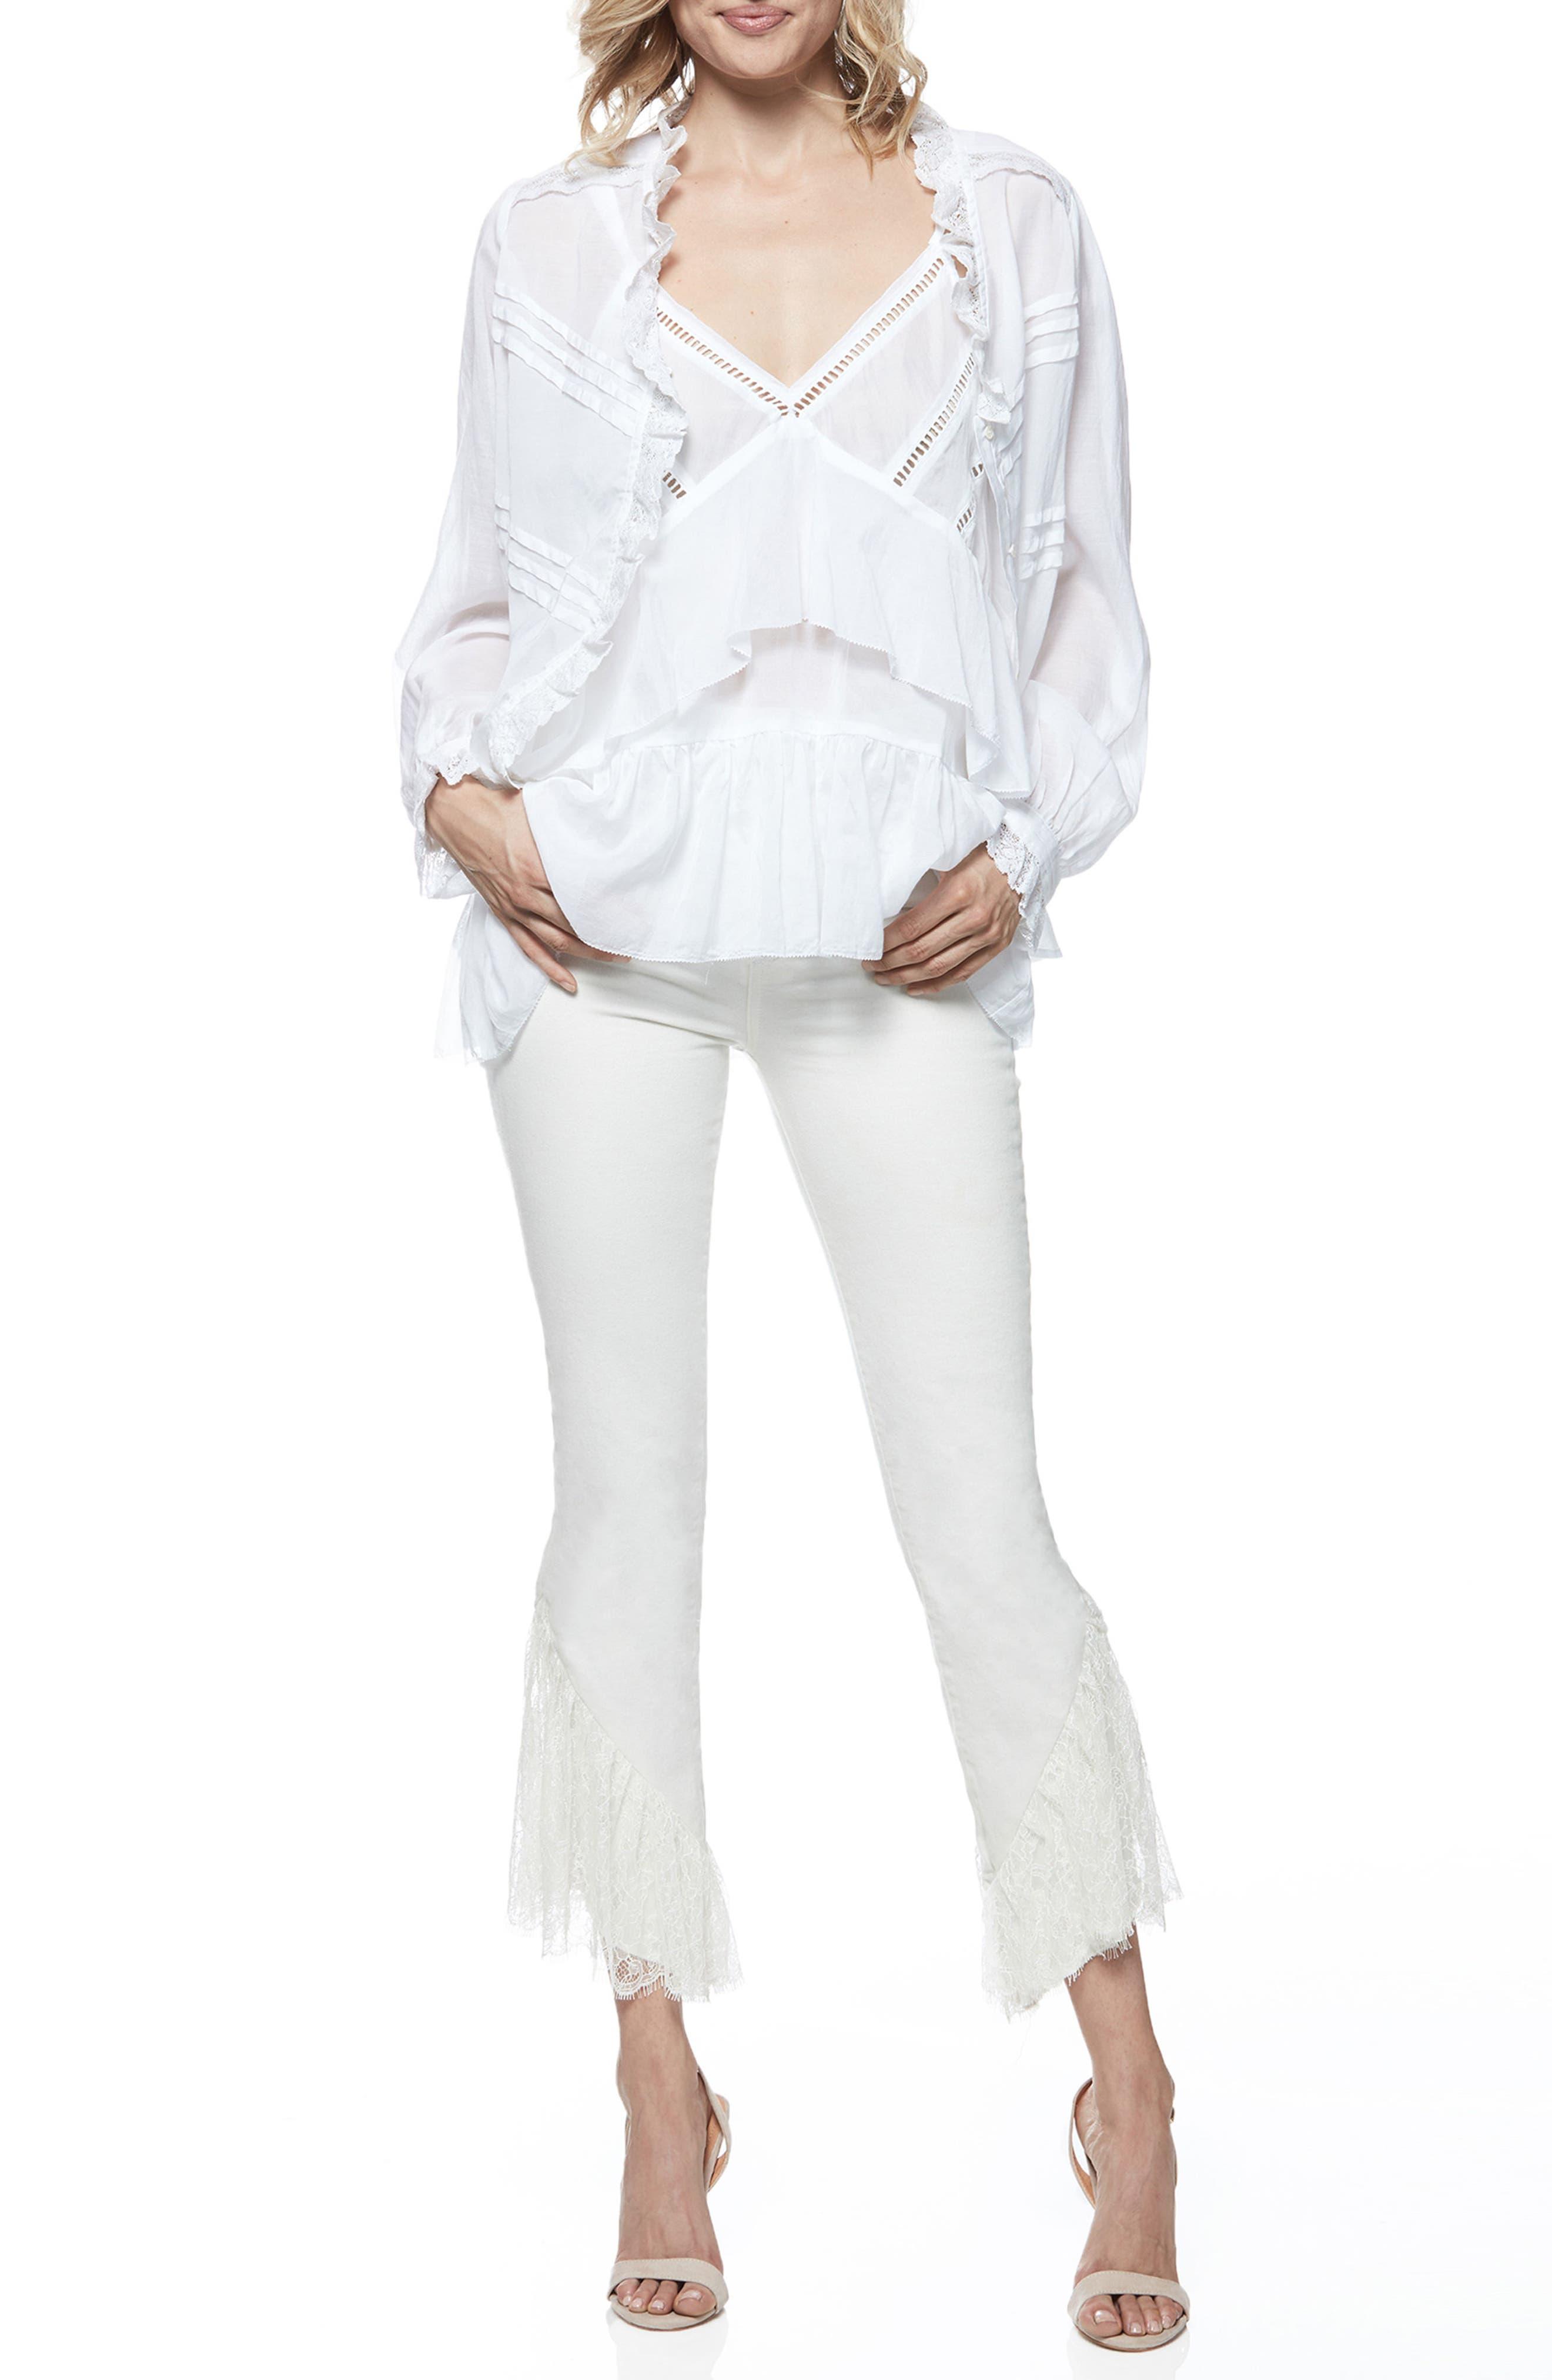 Hoxton Lace Hem High Waist Ankle Straight Leg Jeans,                             Alternate thumbnail 3, color,                             Poodle White